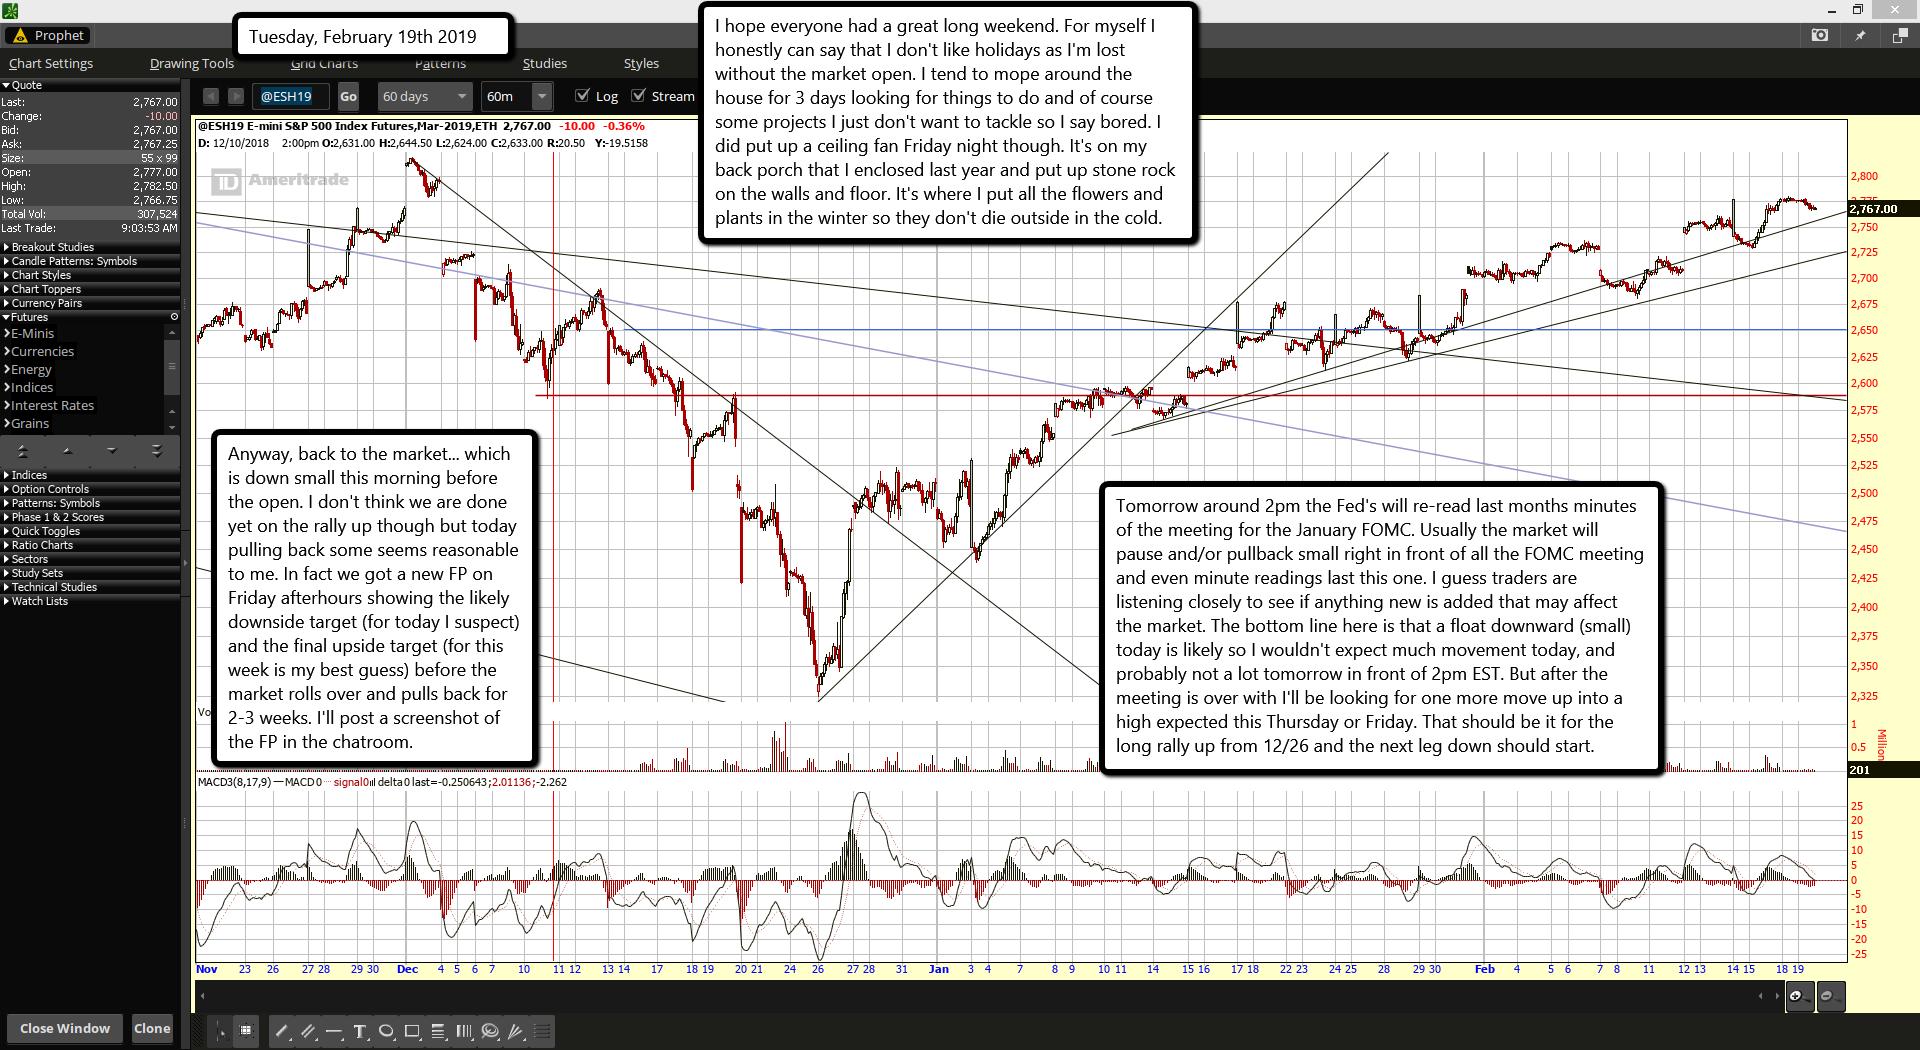 February ipo for leo stock